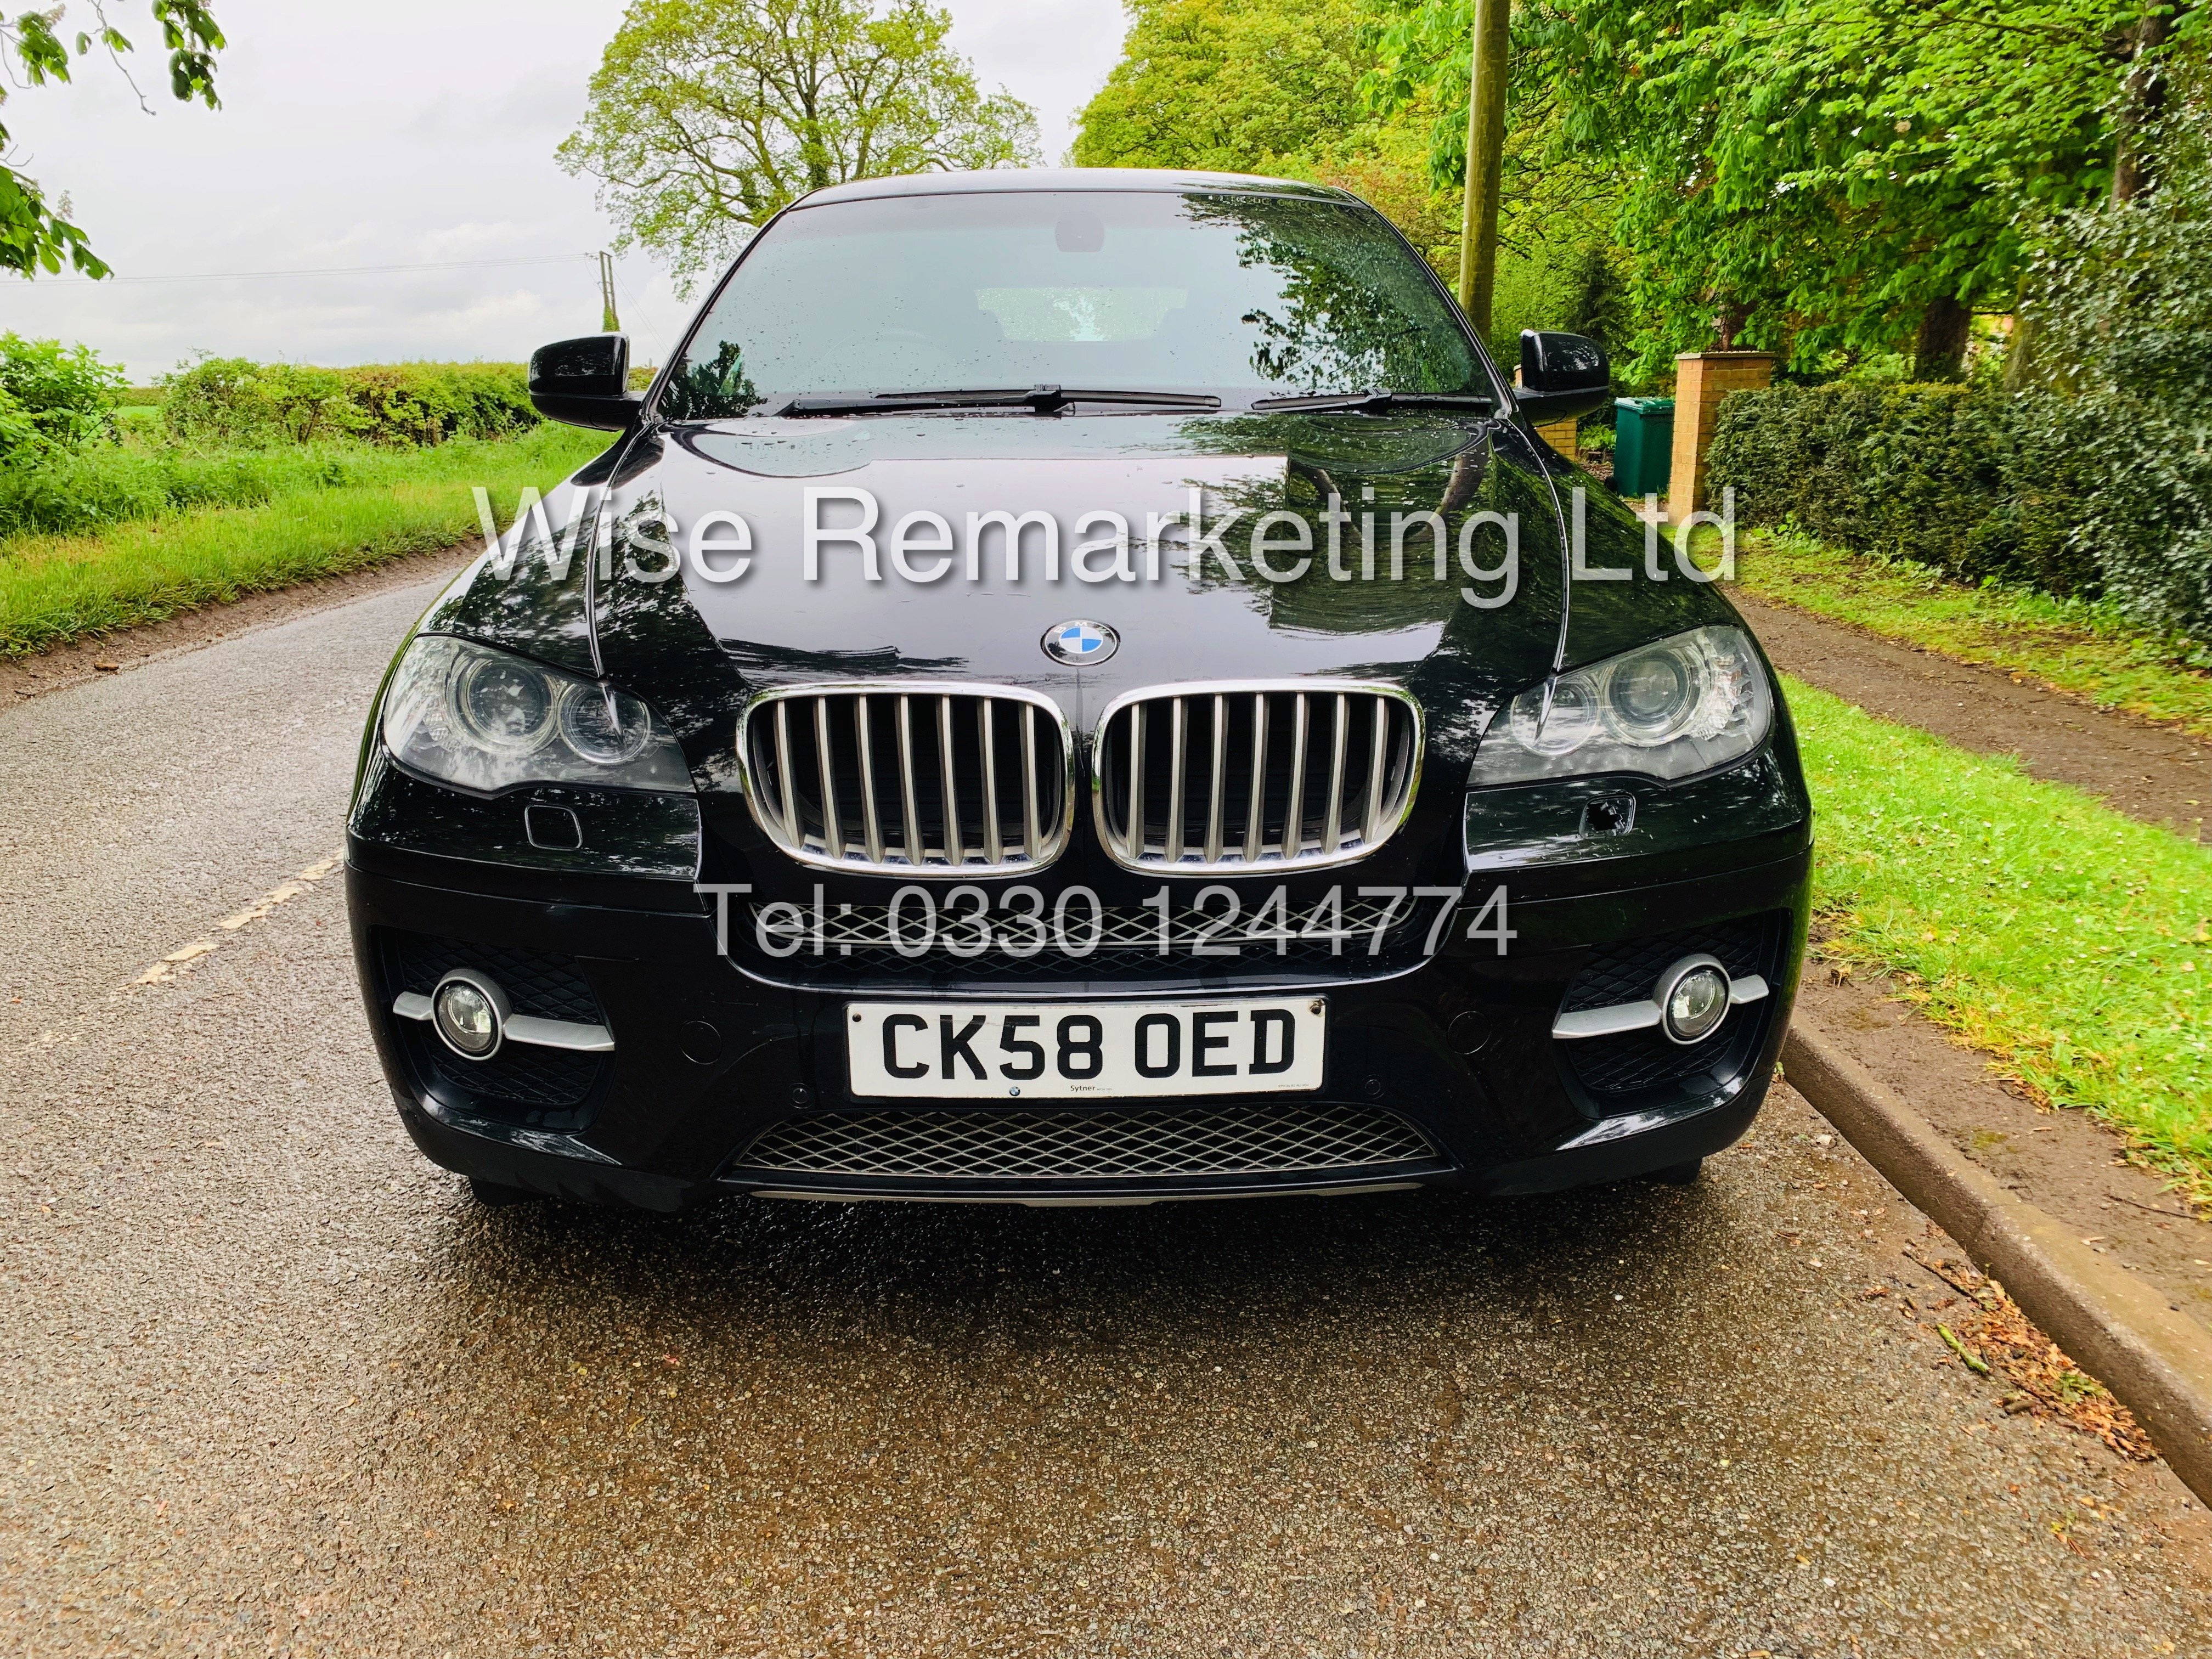 BMW X6 XDRIVE 35D AUTO (2009 SPEC) *1 PREVIOUS OWNER* PARKING AID - SAT NAV - FSH - Image 4 of 25